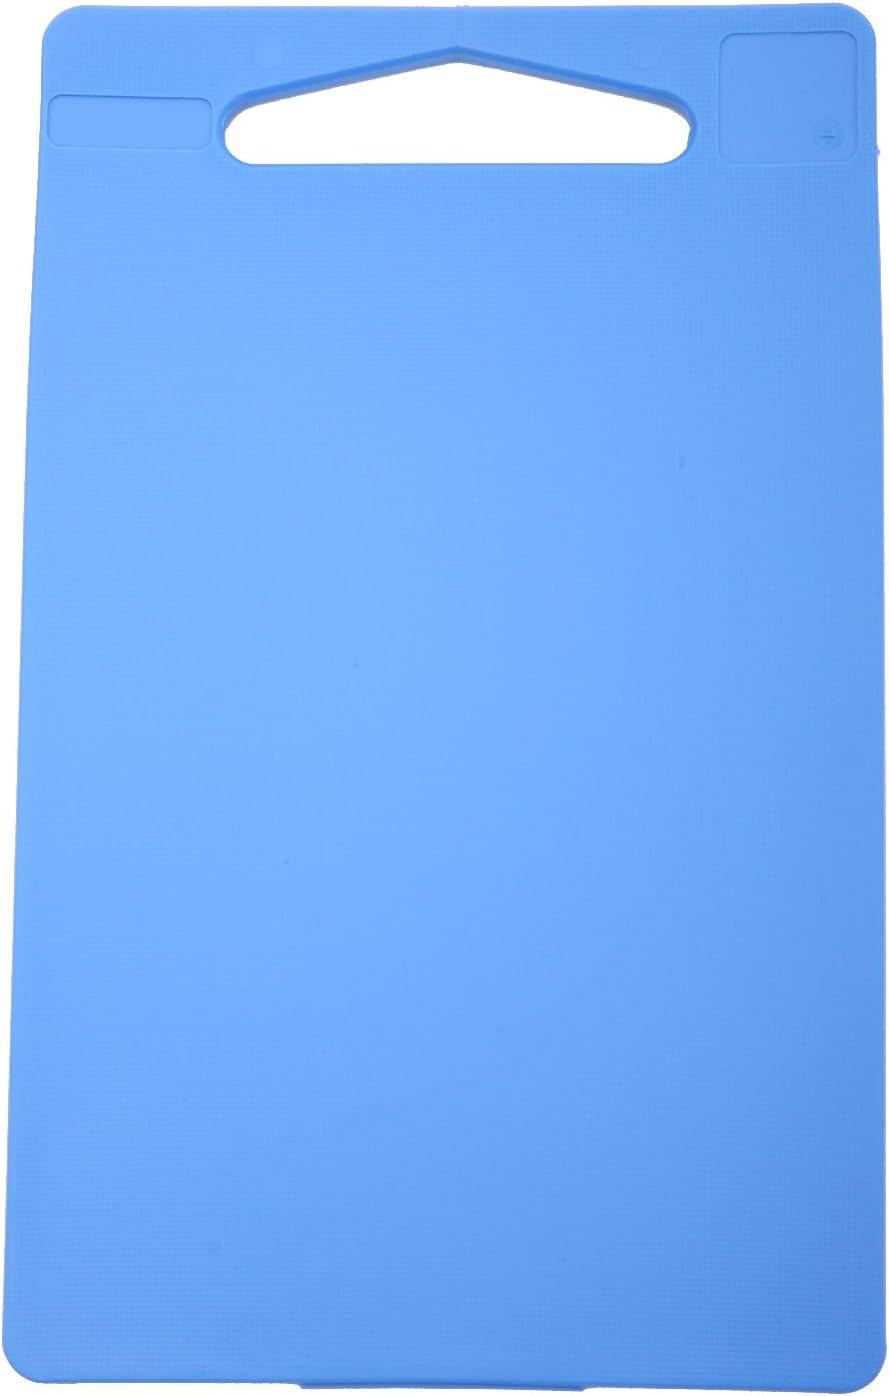 Linden Sweden Daloplast Anita Bar Board, Small, Light Blue by Linden Sweden: Amazon.es: Hogar